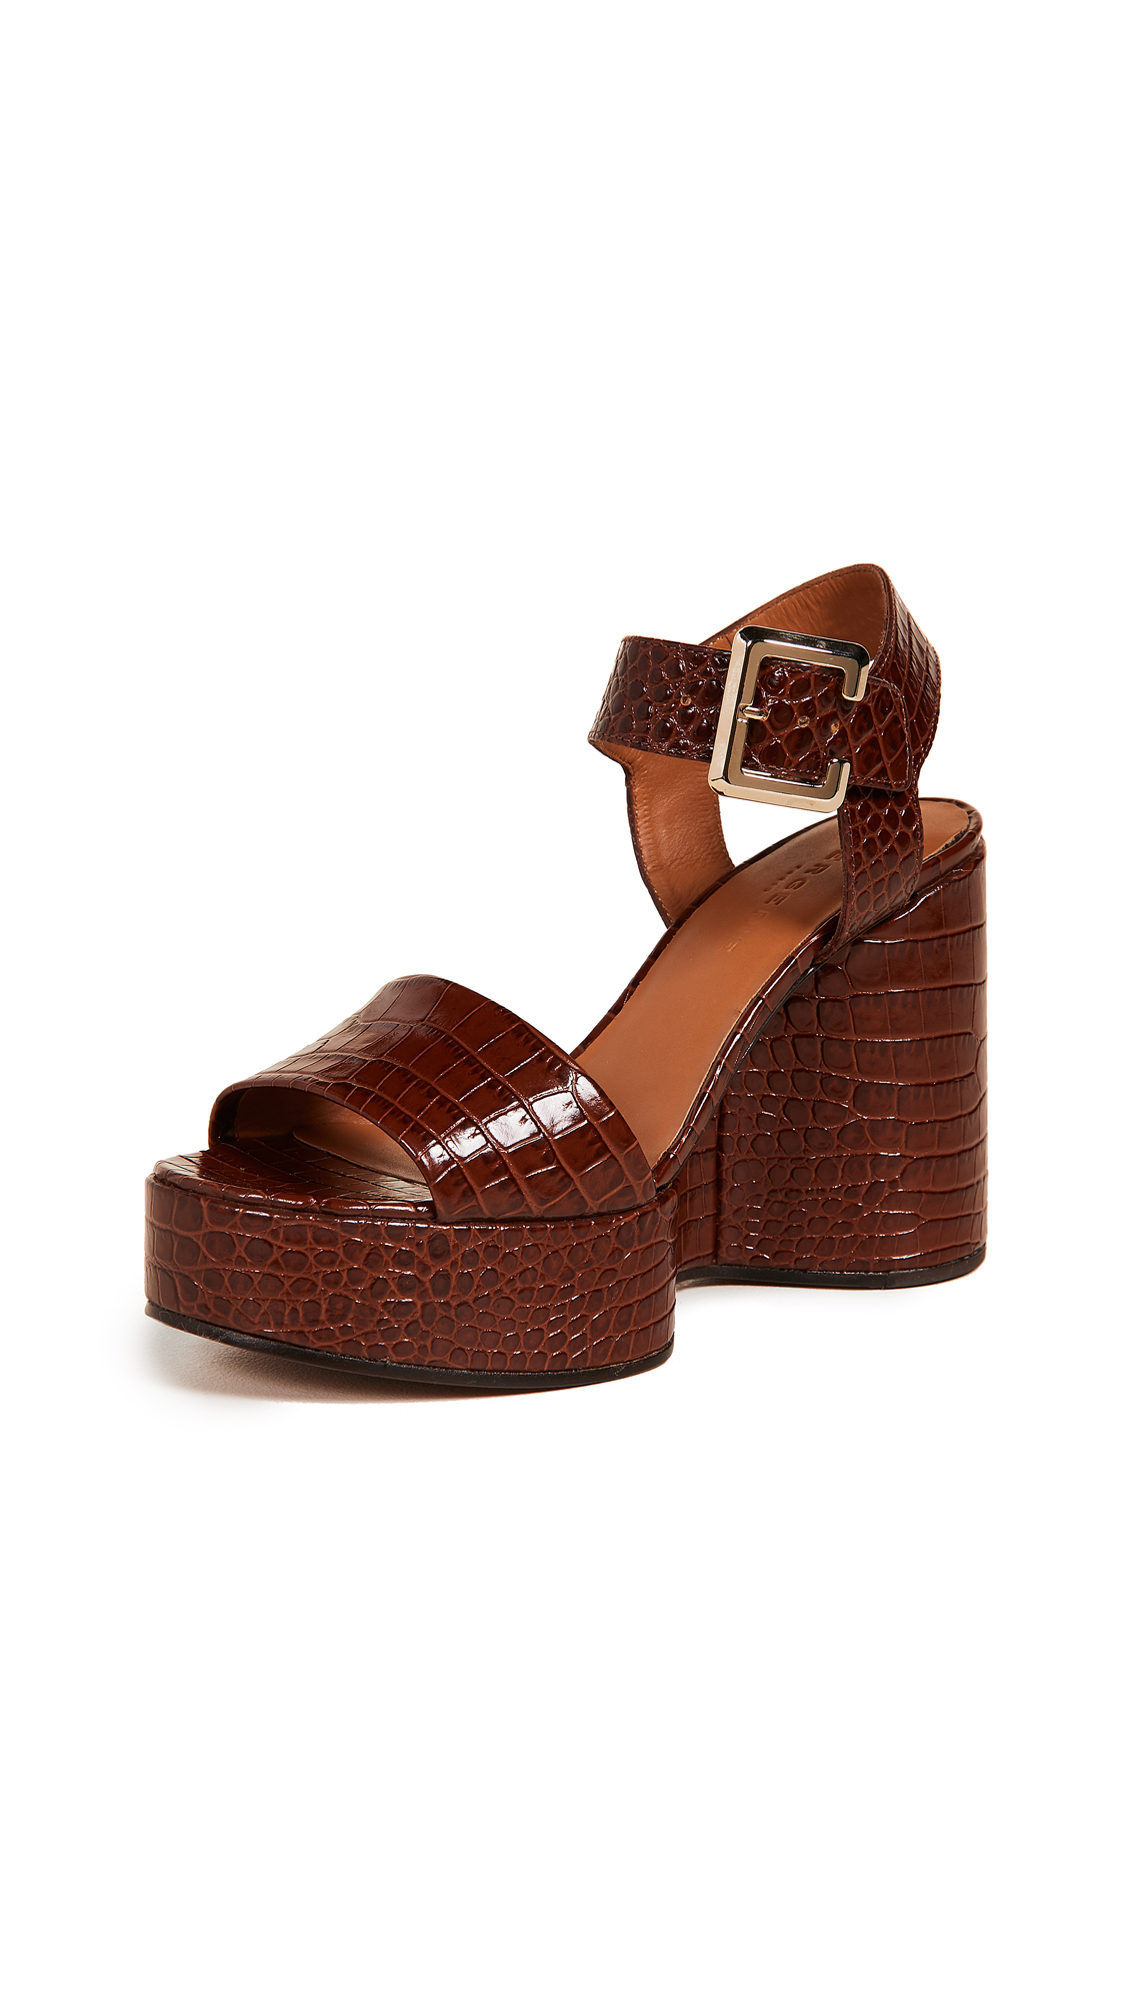 Robert Clergerie Altesse Wedge Sandals - Papaya